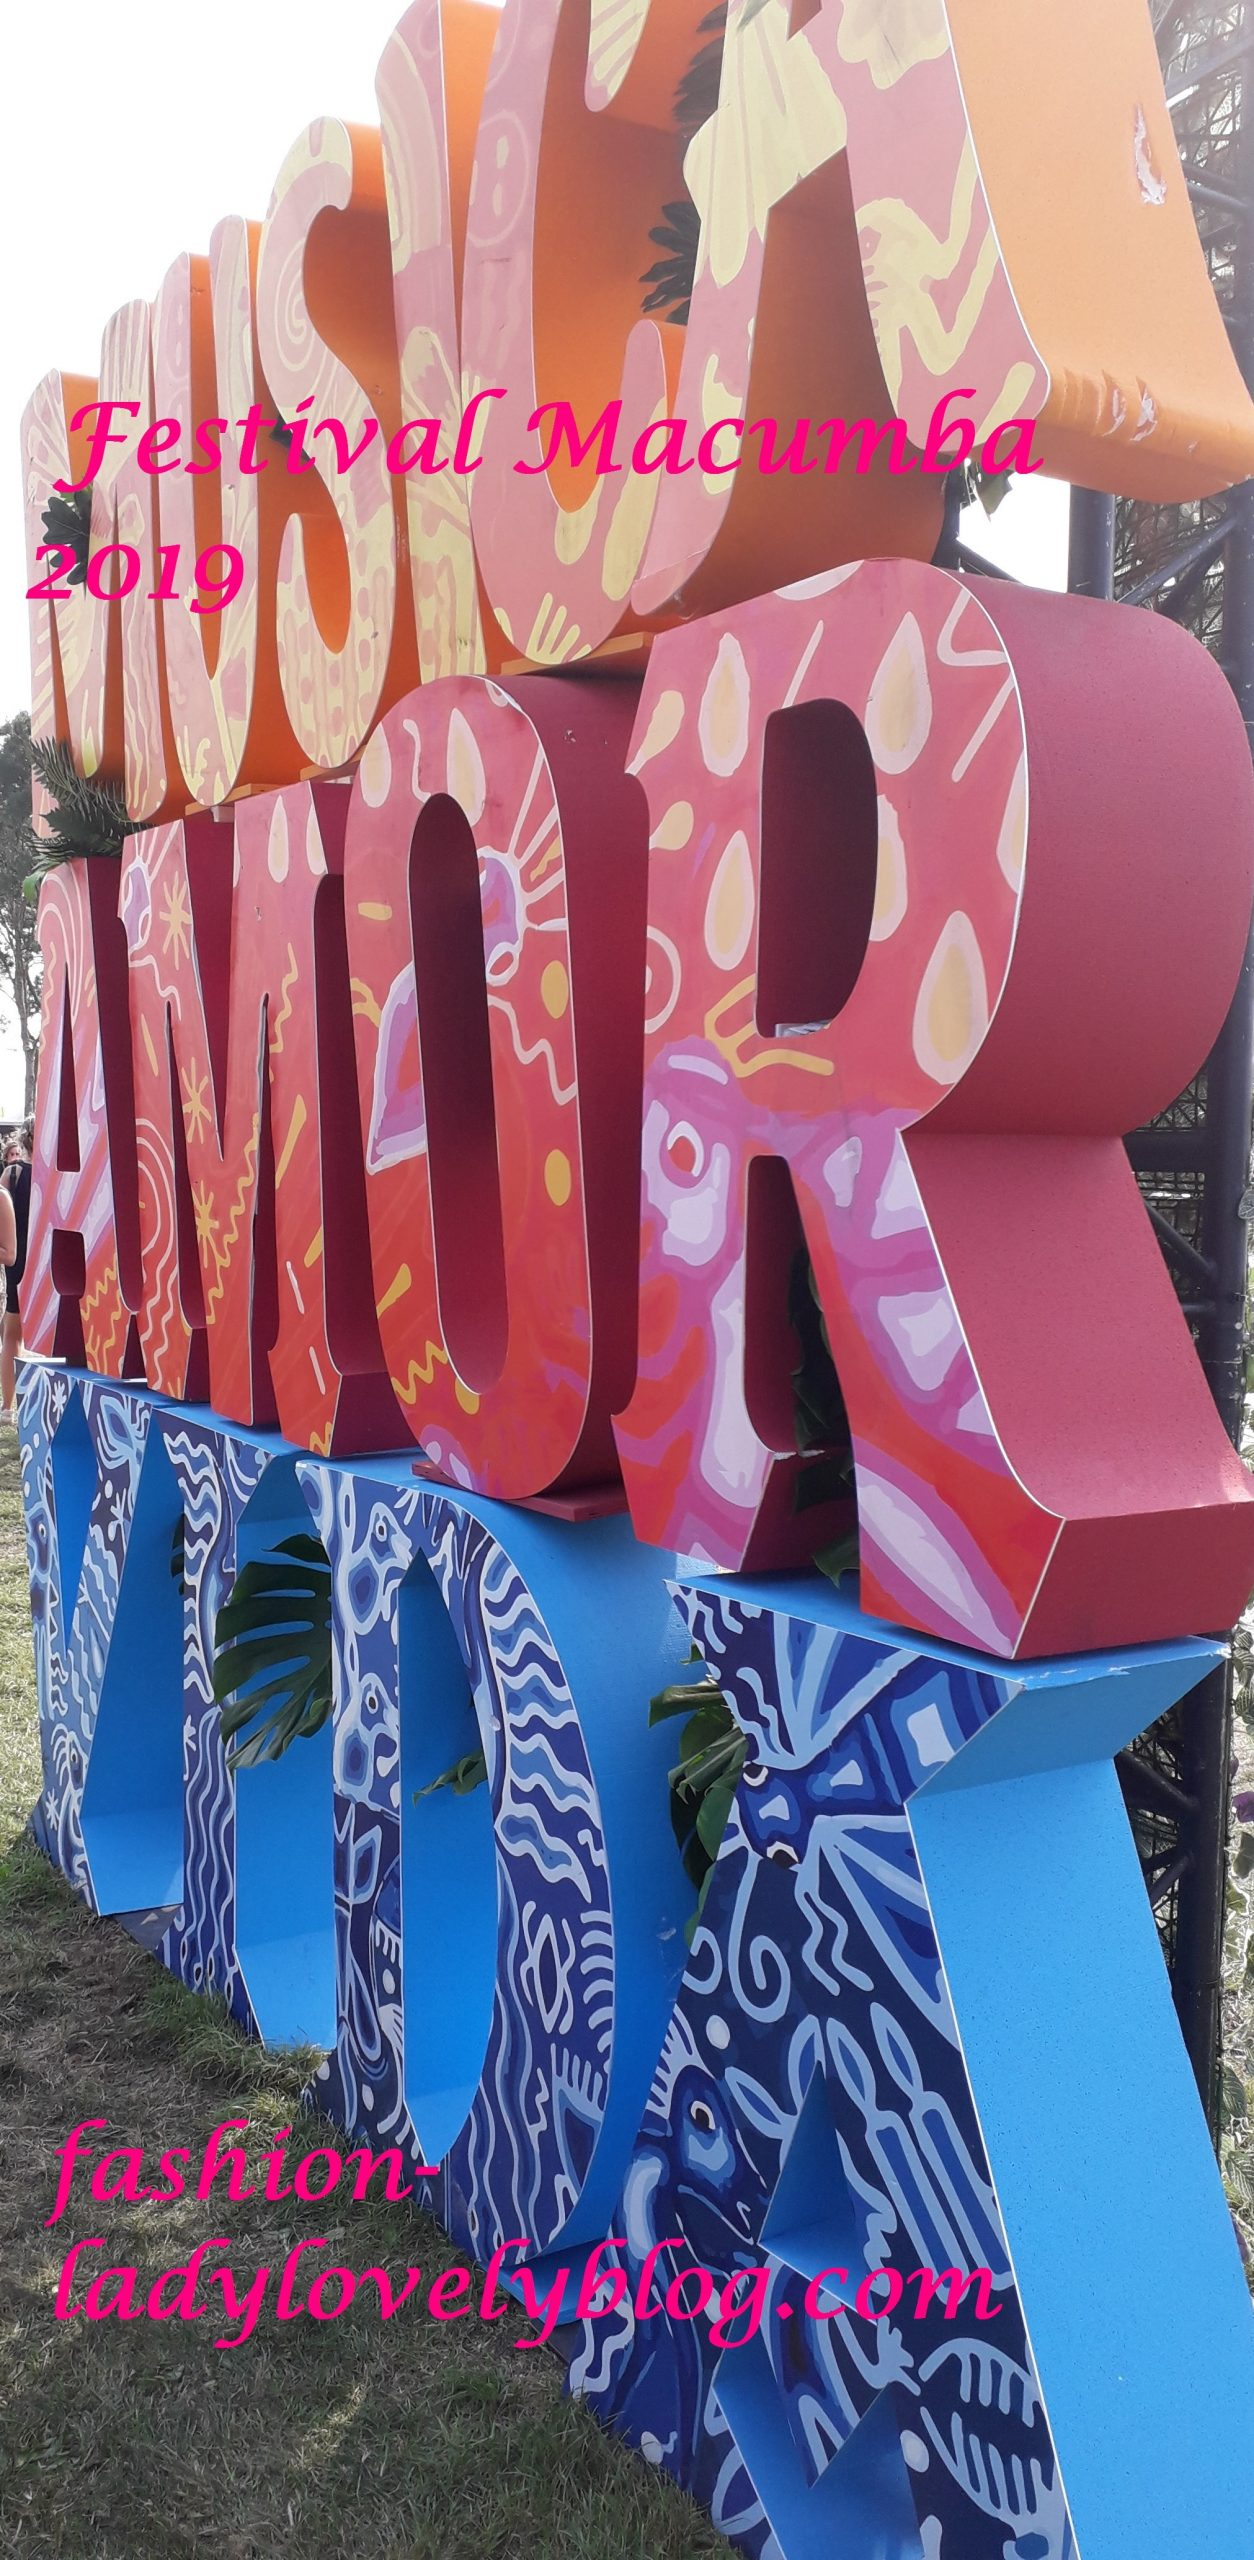 Festival Macumba 2019